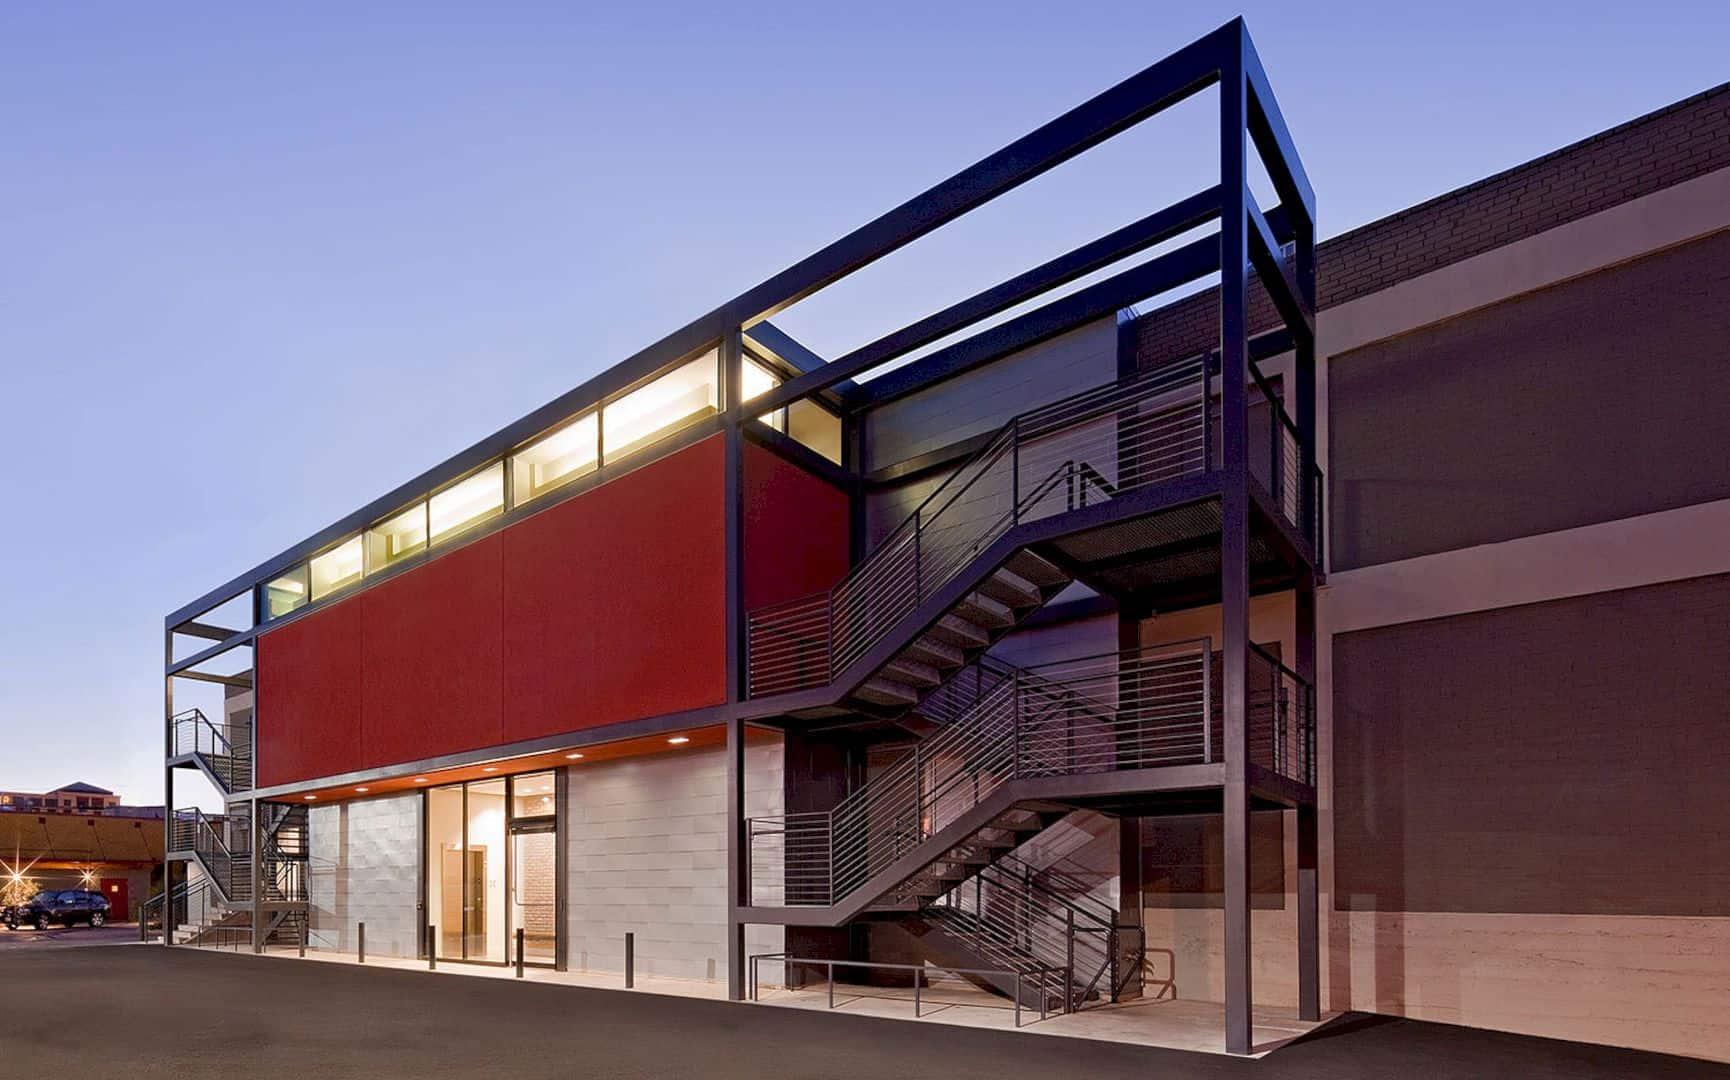 San Jacinto Building By Specht Architects 3